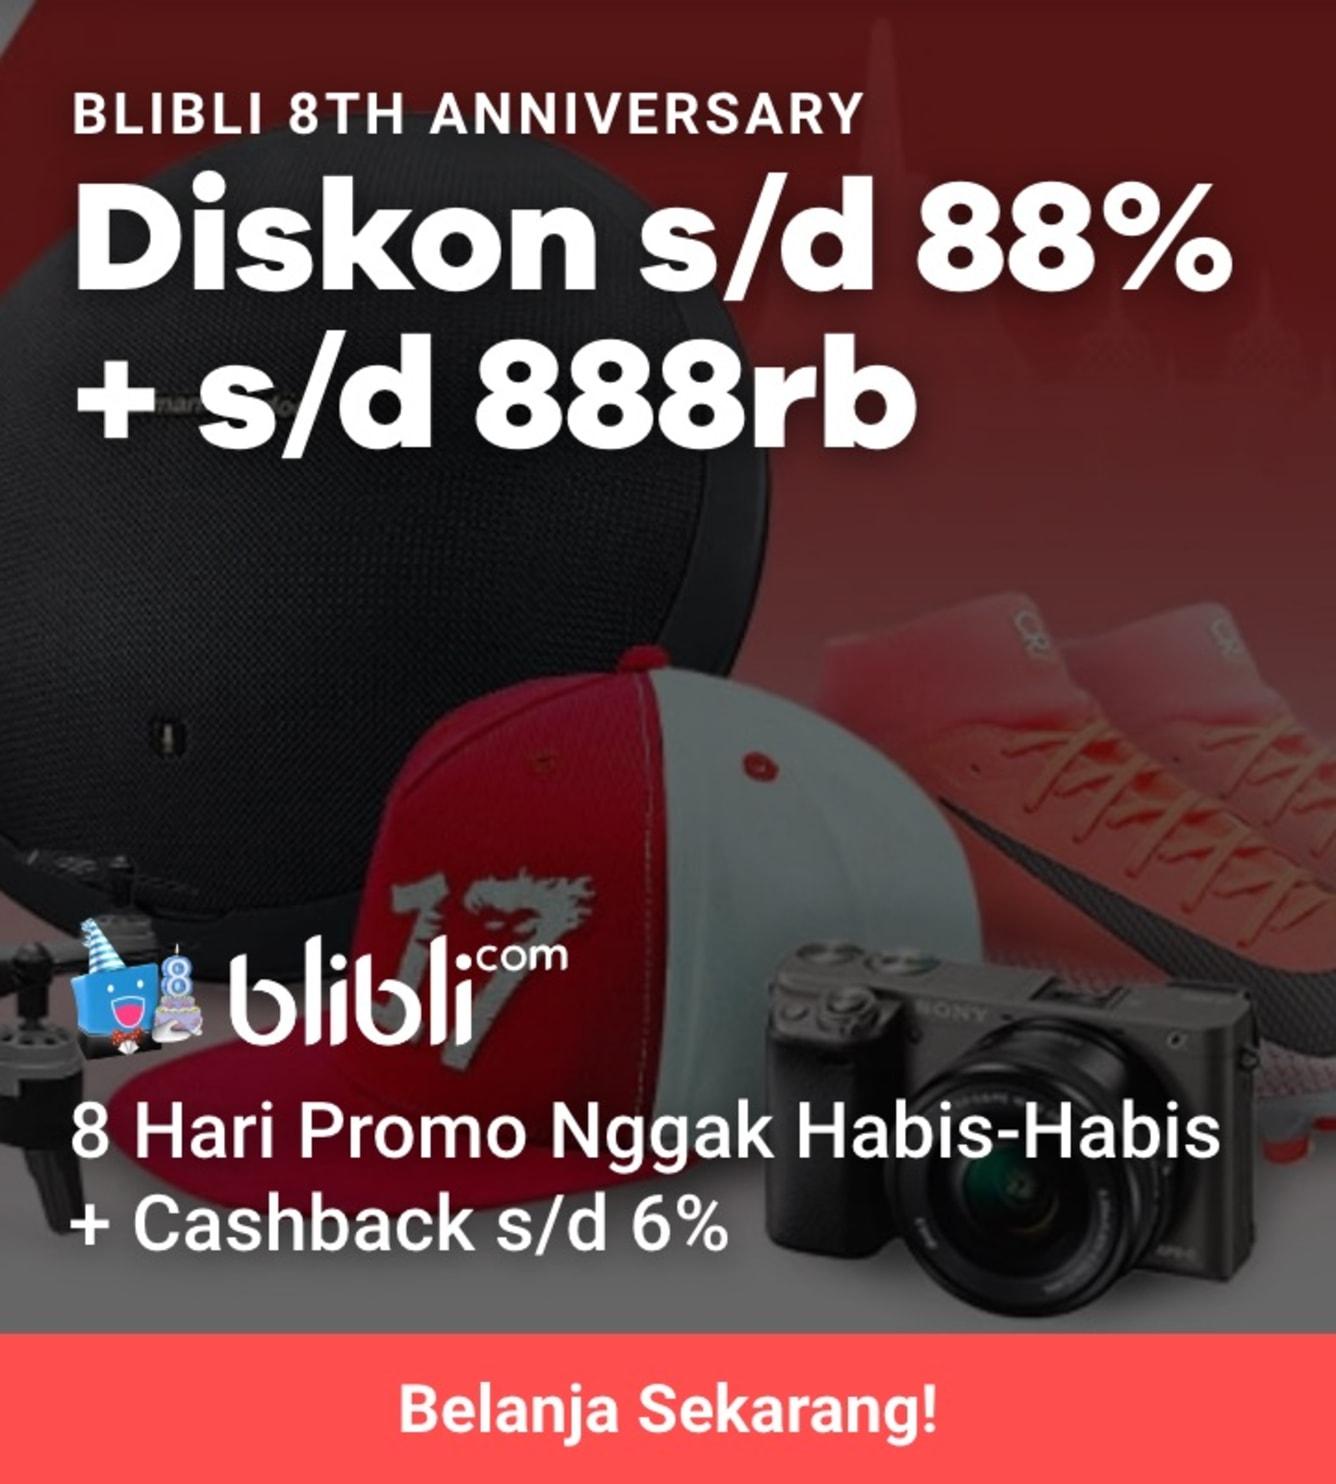 Week 34 - Promo Blibli